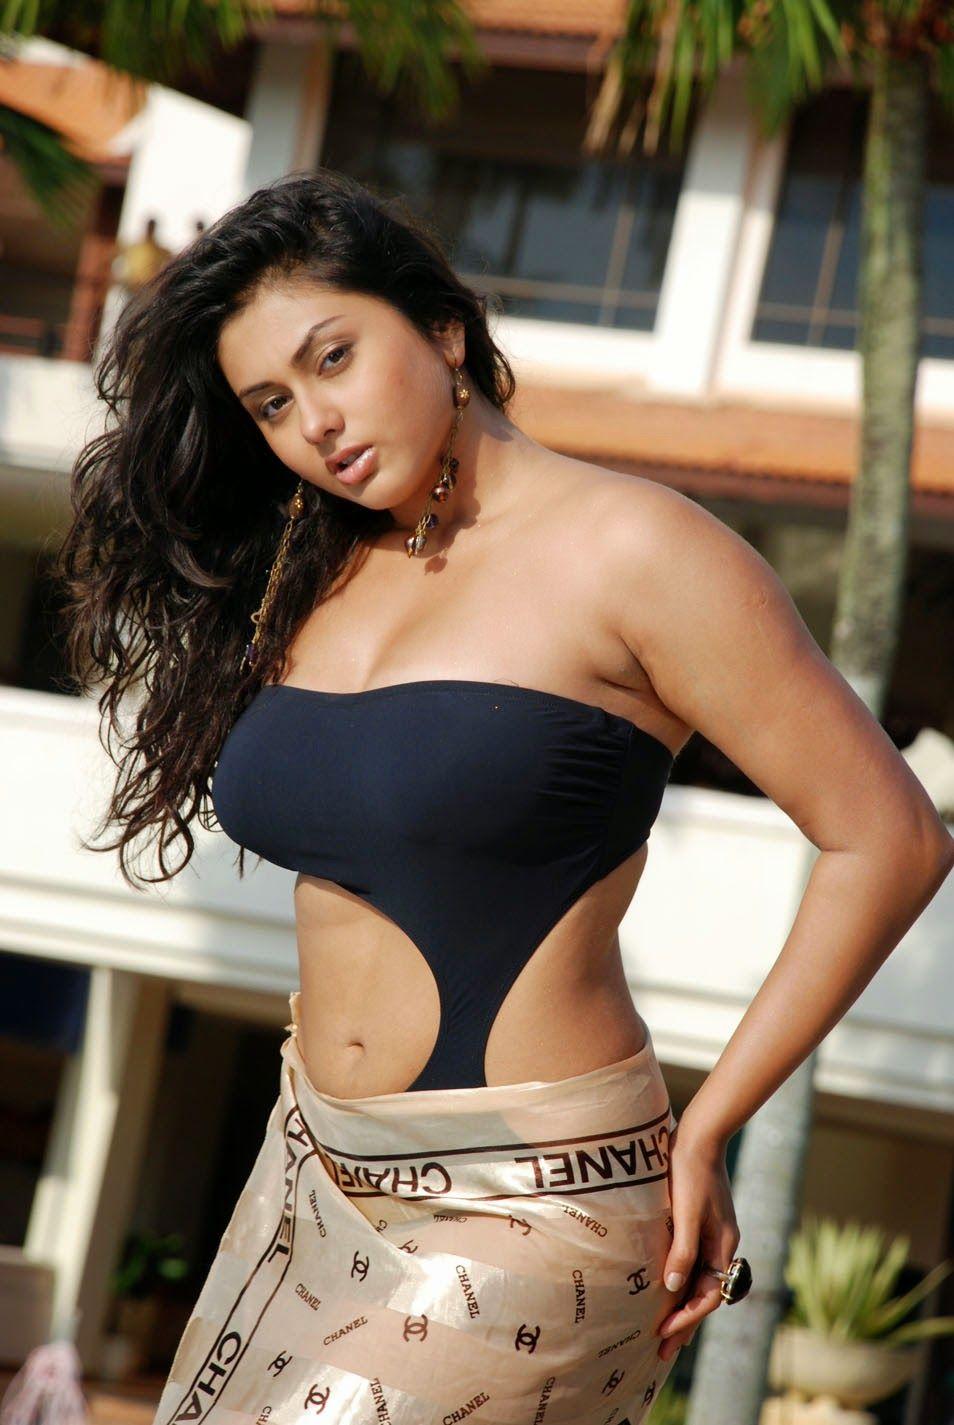 Oolal Actress Namitha Hot And Sexy Dresses